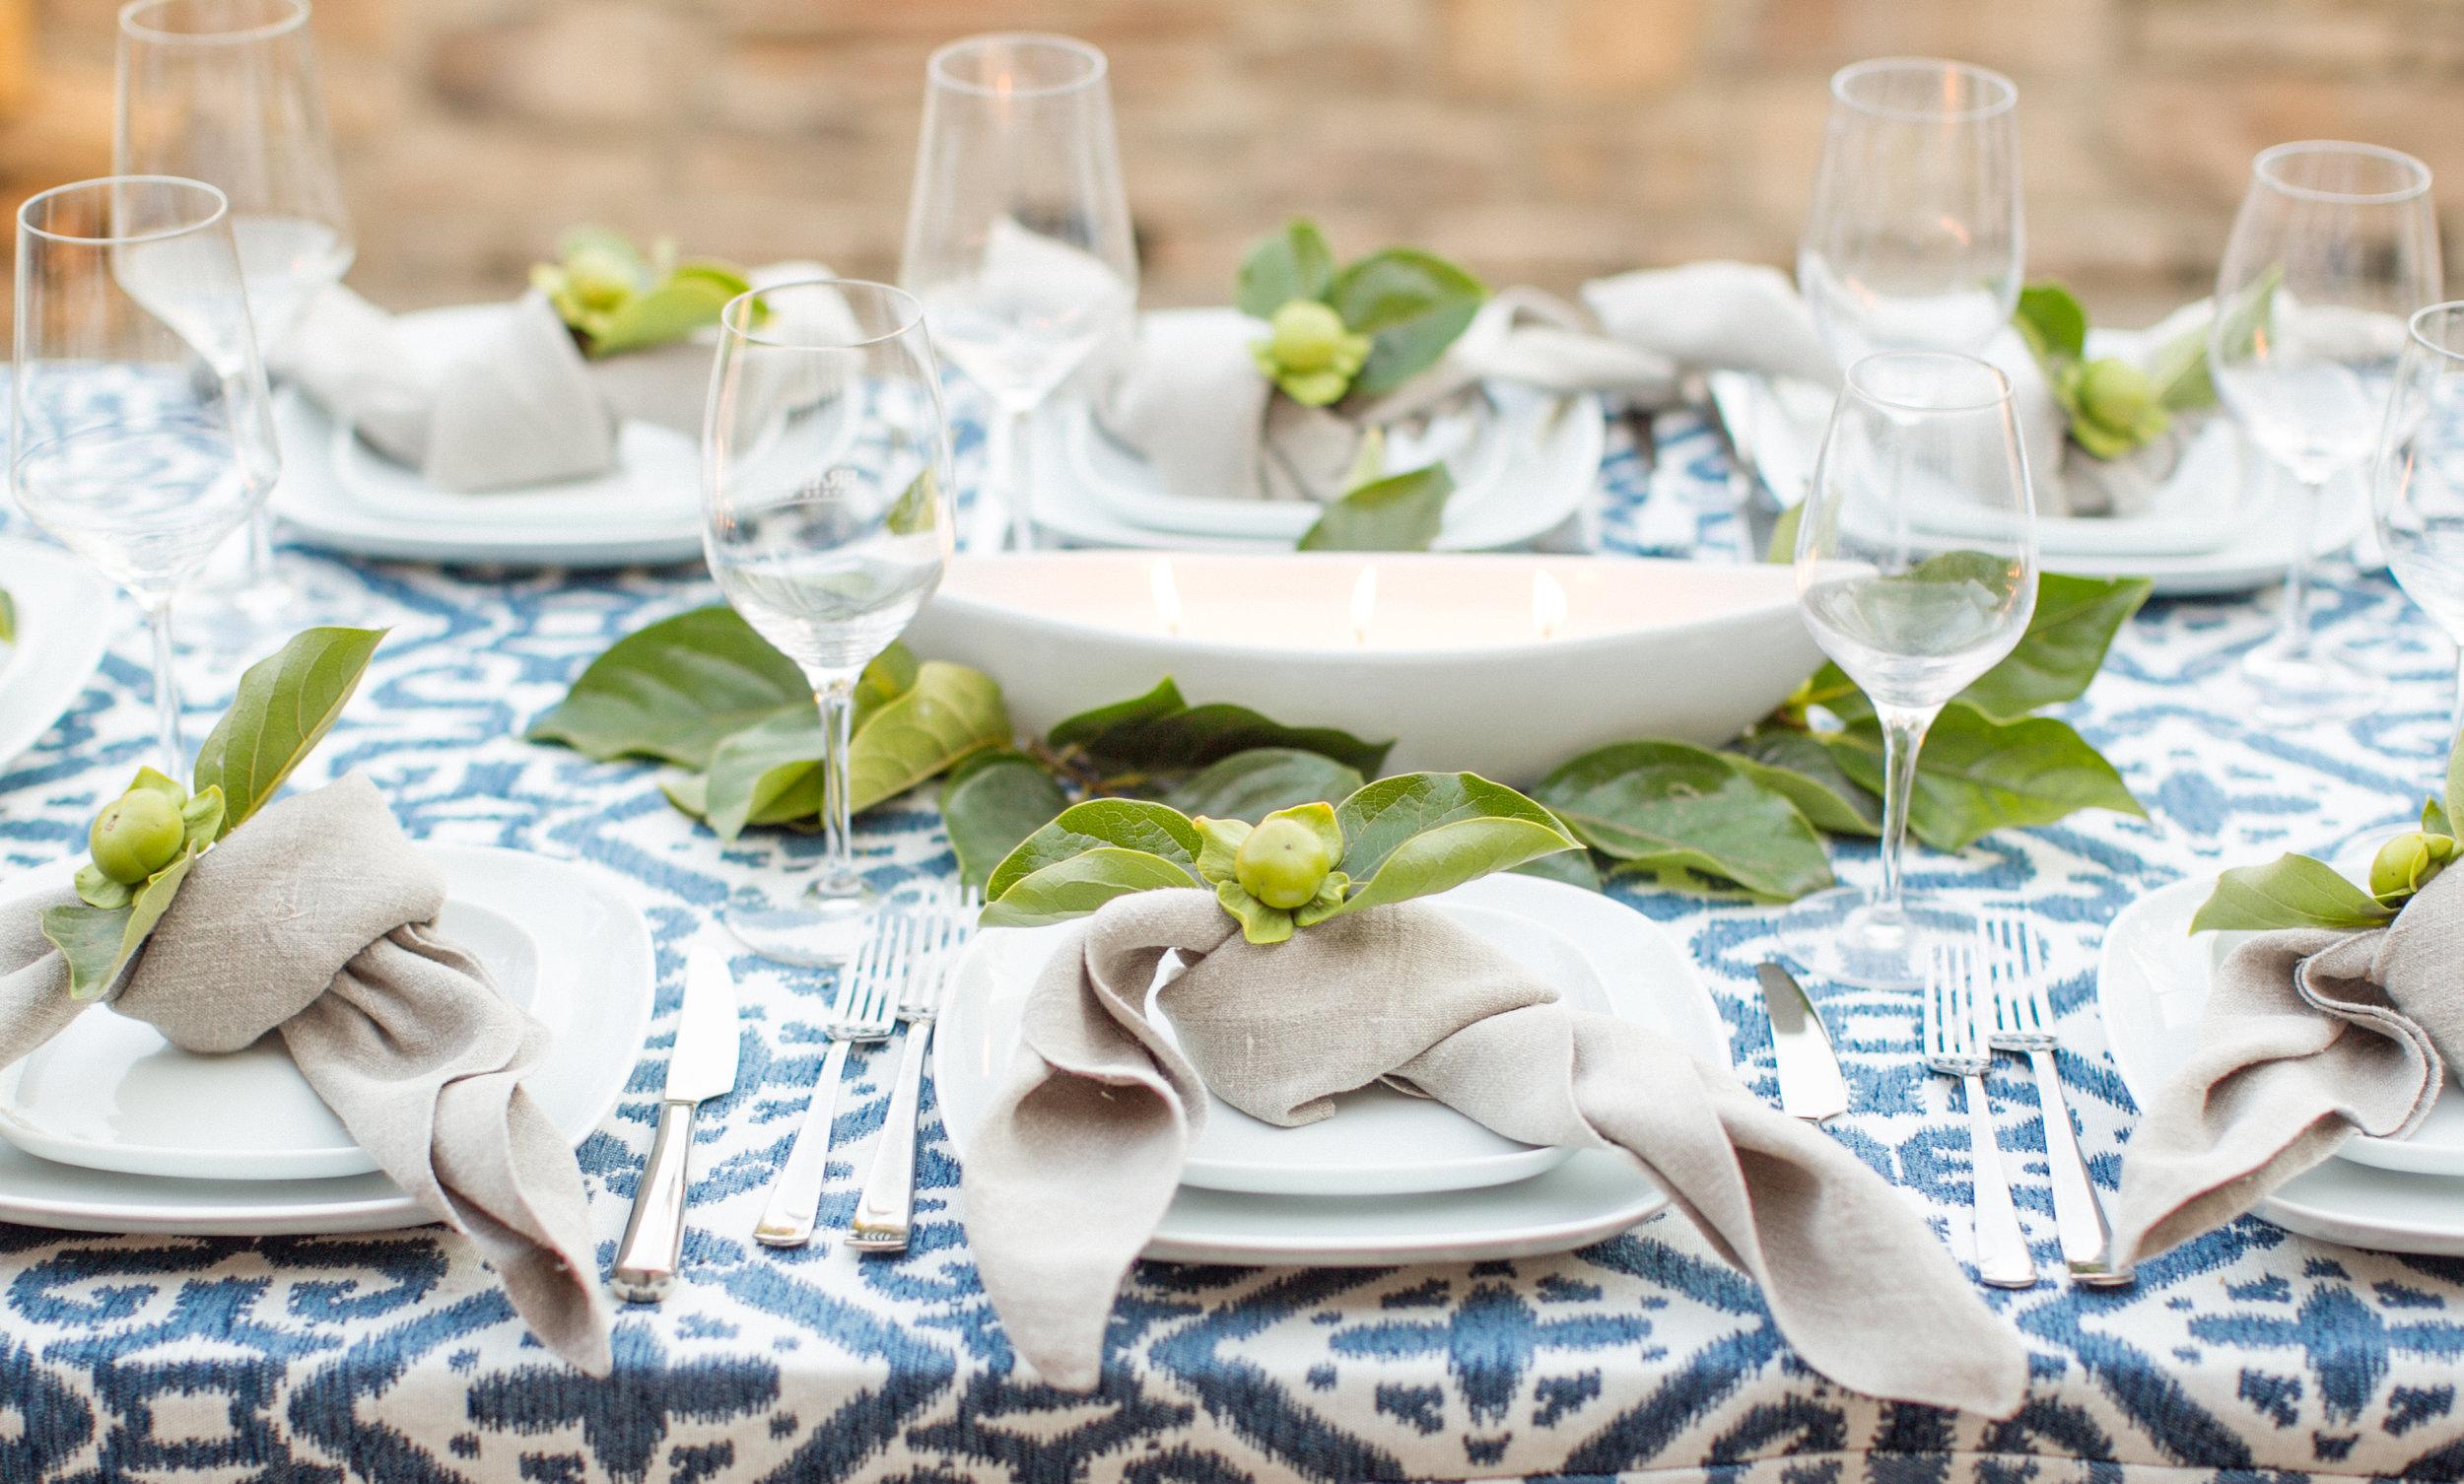 www.santabarbarawedding.com | Atelier de La Fleur Weddings & Events | Mike Larson | Rehearsal Dinner Table